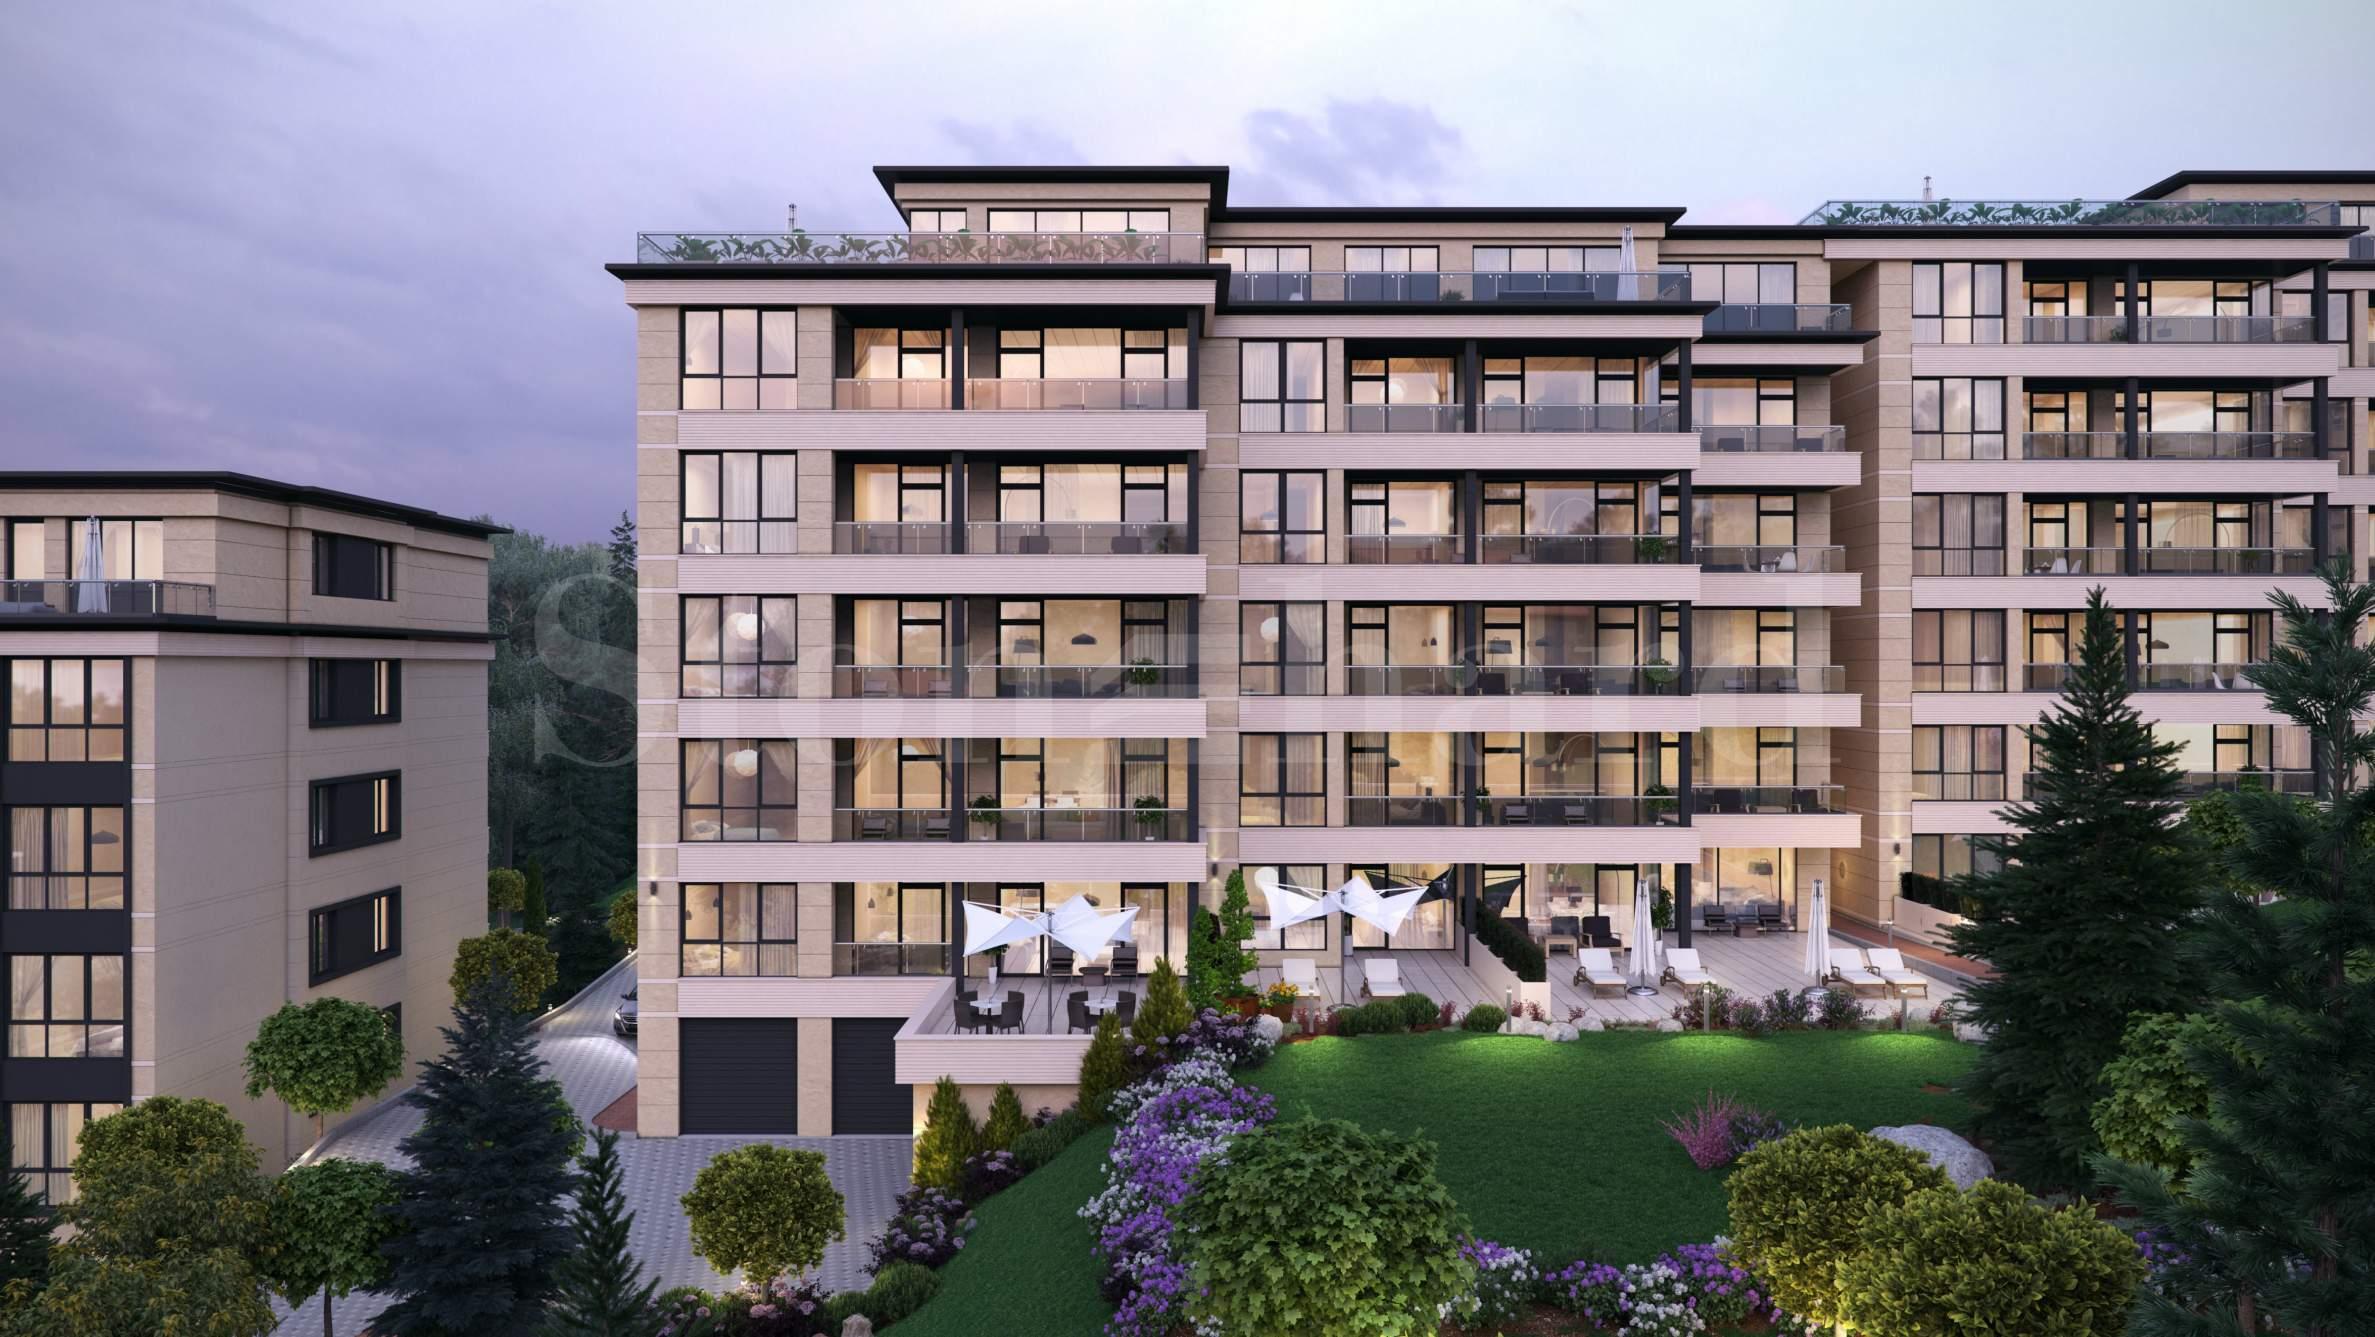 Luxury residential complex in Sofia's premium district of Boyana2 - Stonehard